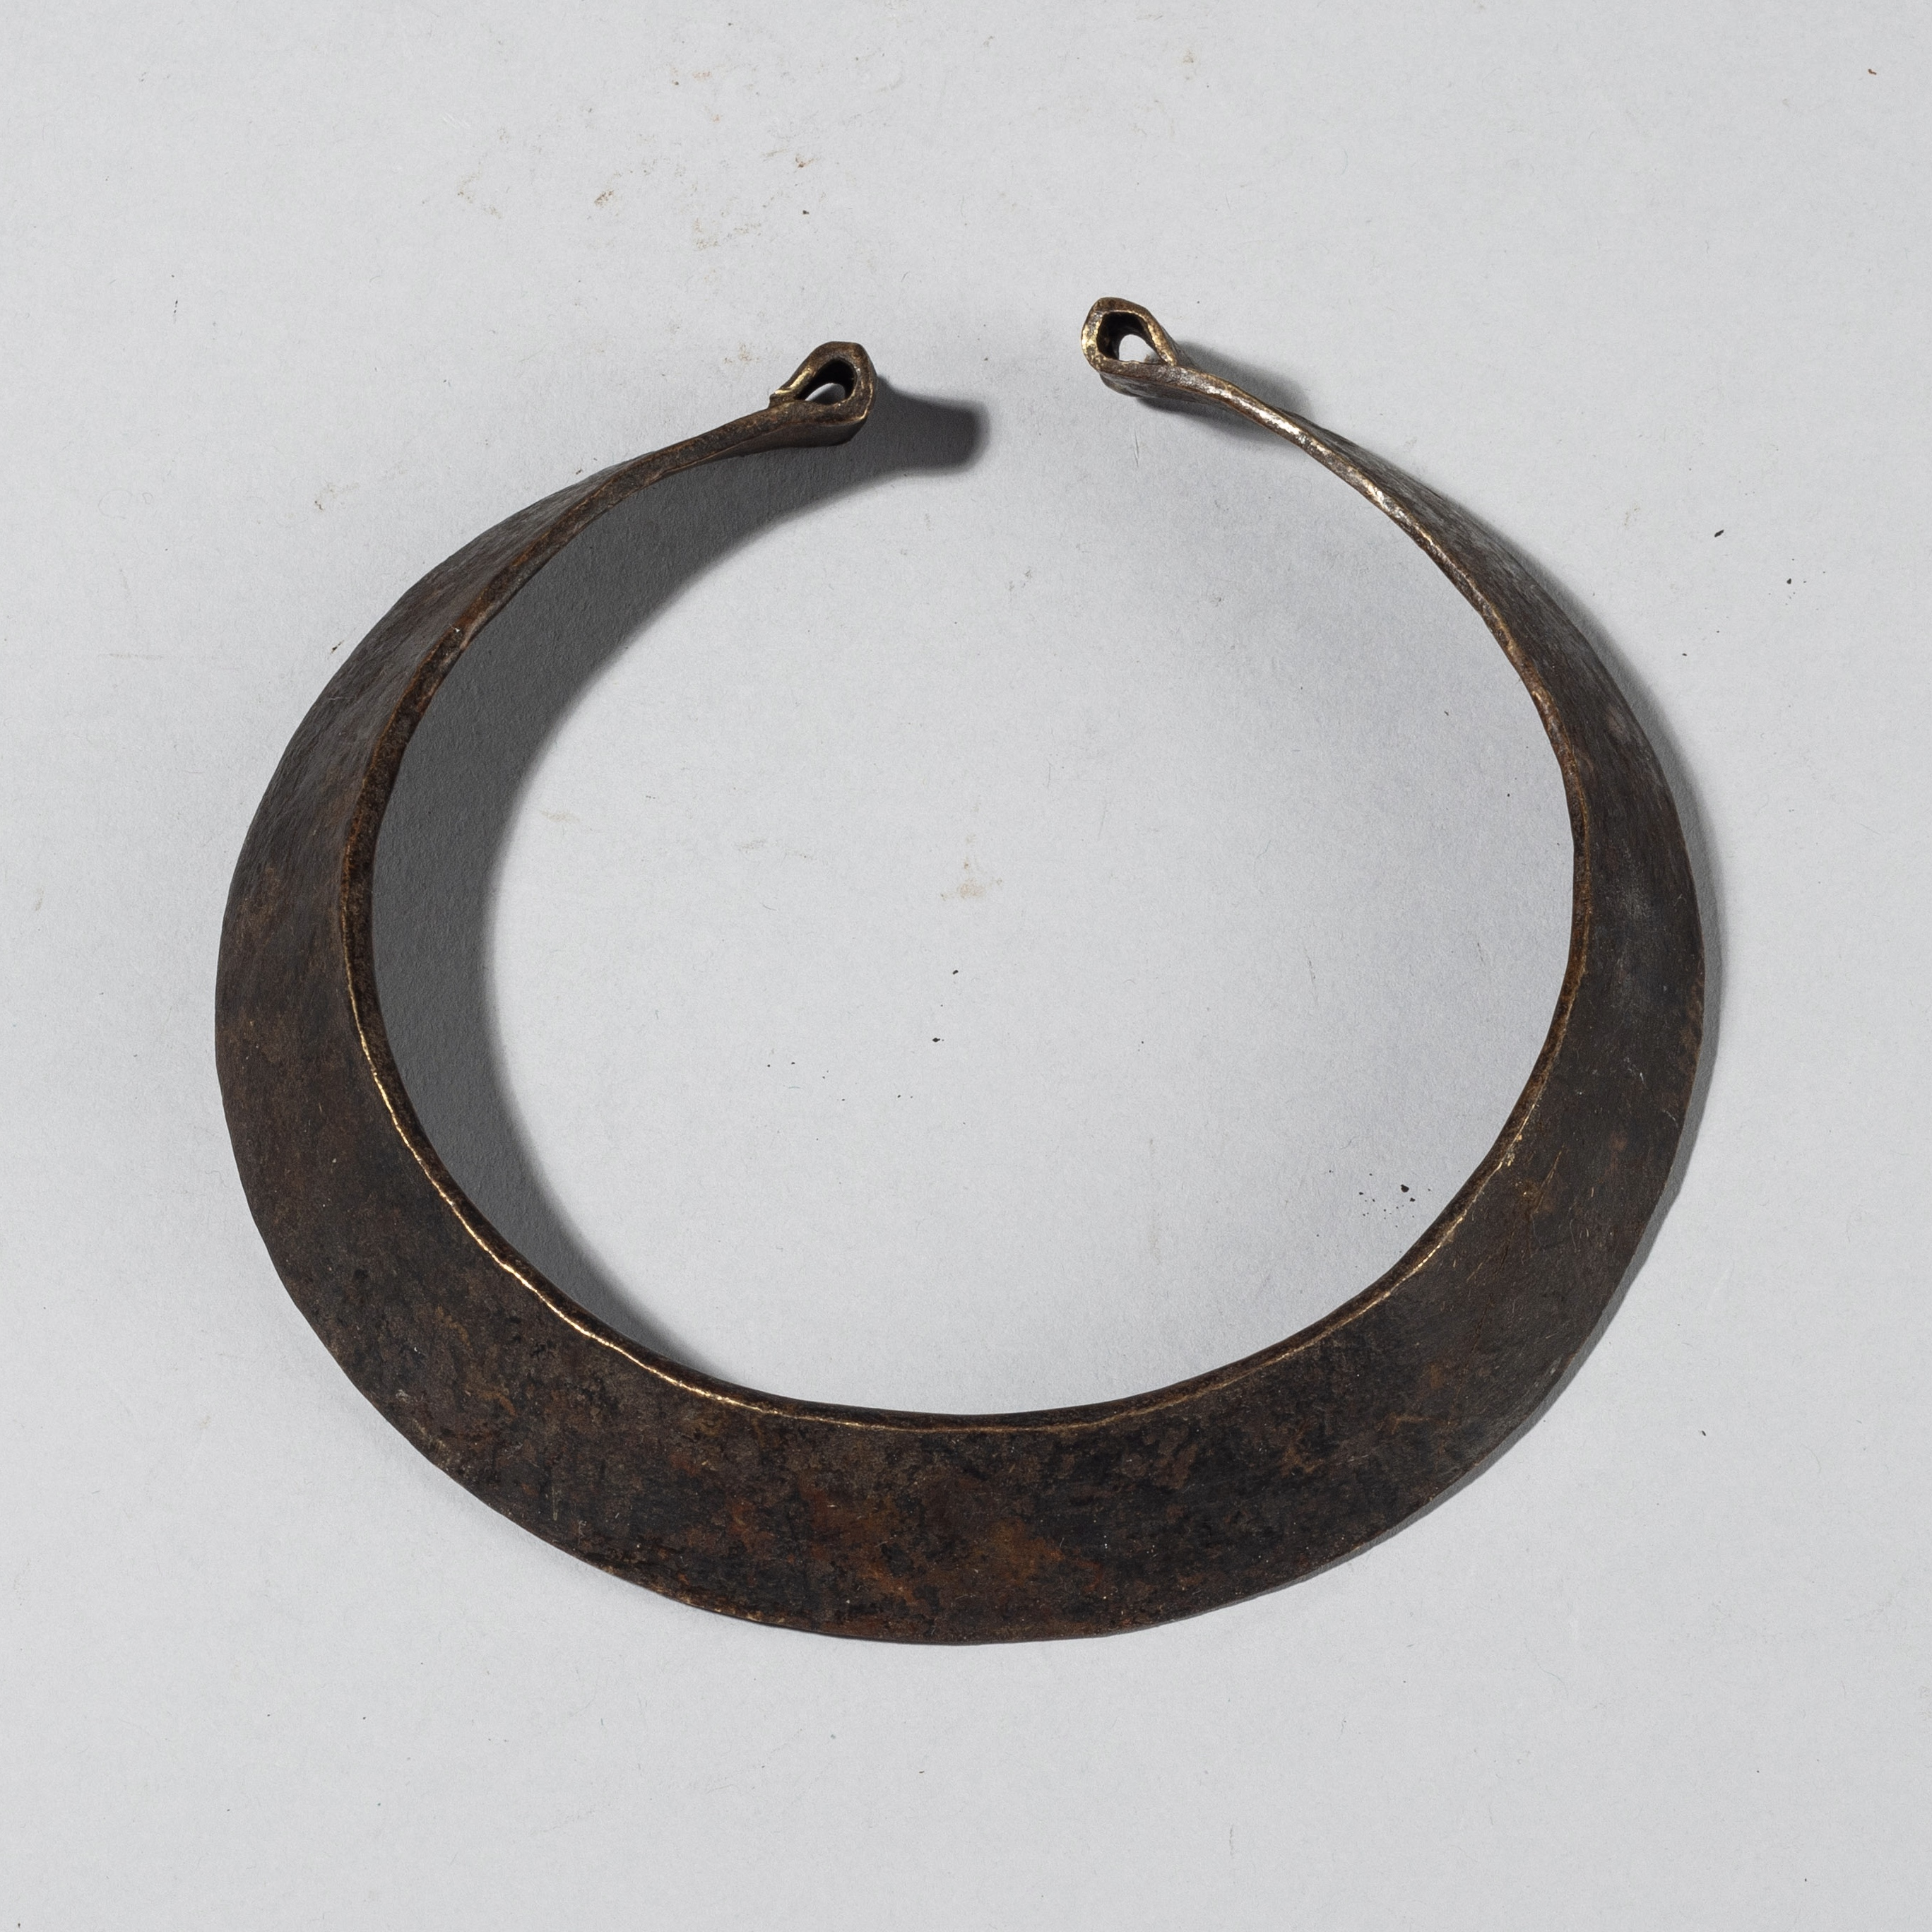 A SIMPLE BRASS TORQUE NECKLACE, LATUKU TRIBE SUDAN E. AFRICA ( No 4339)